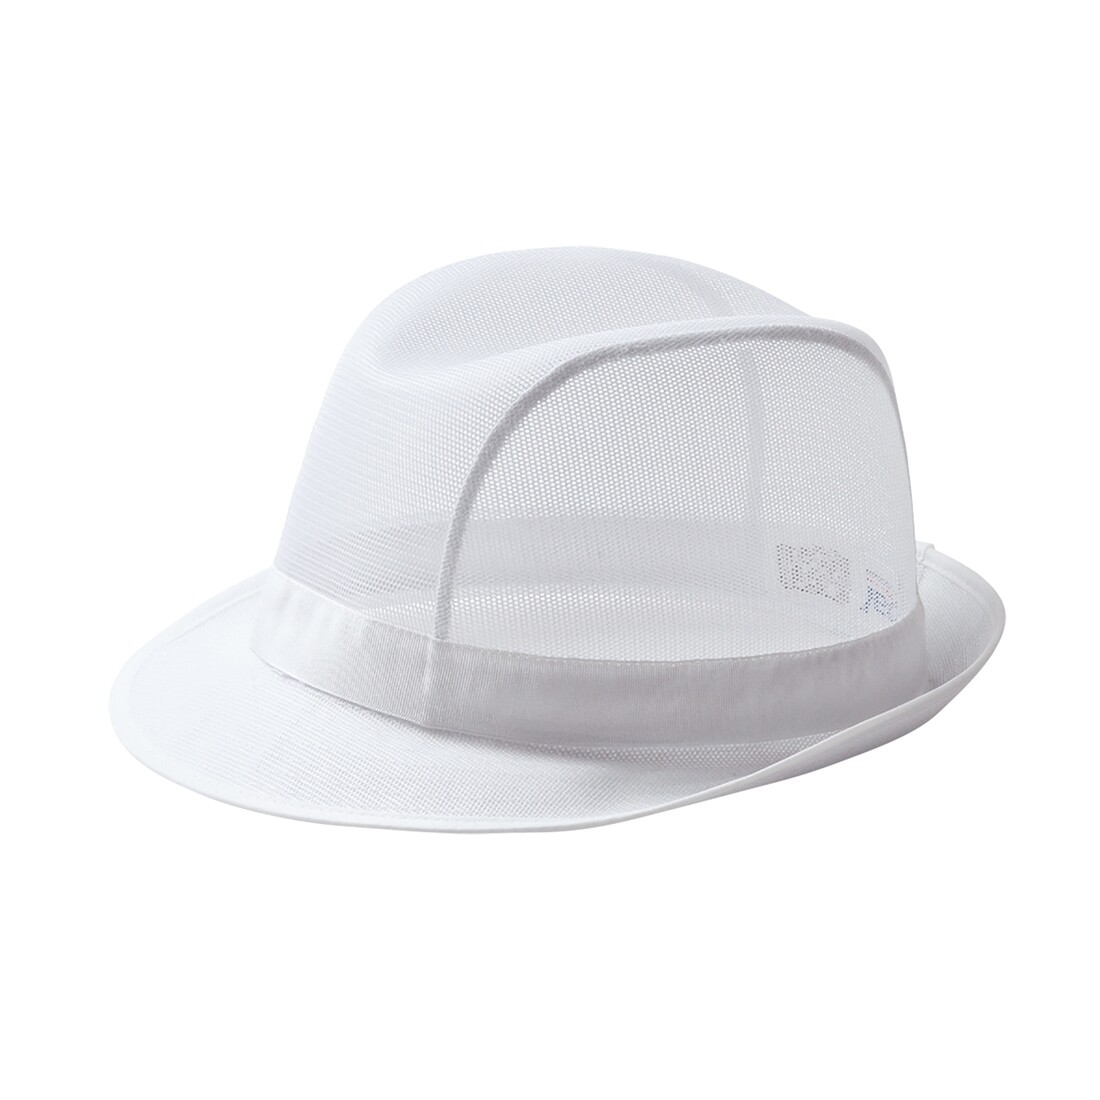 C600 TRILBY HAT